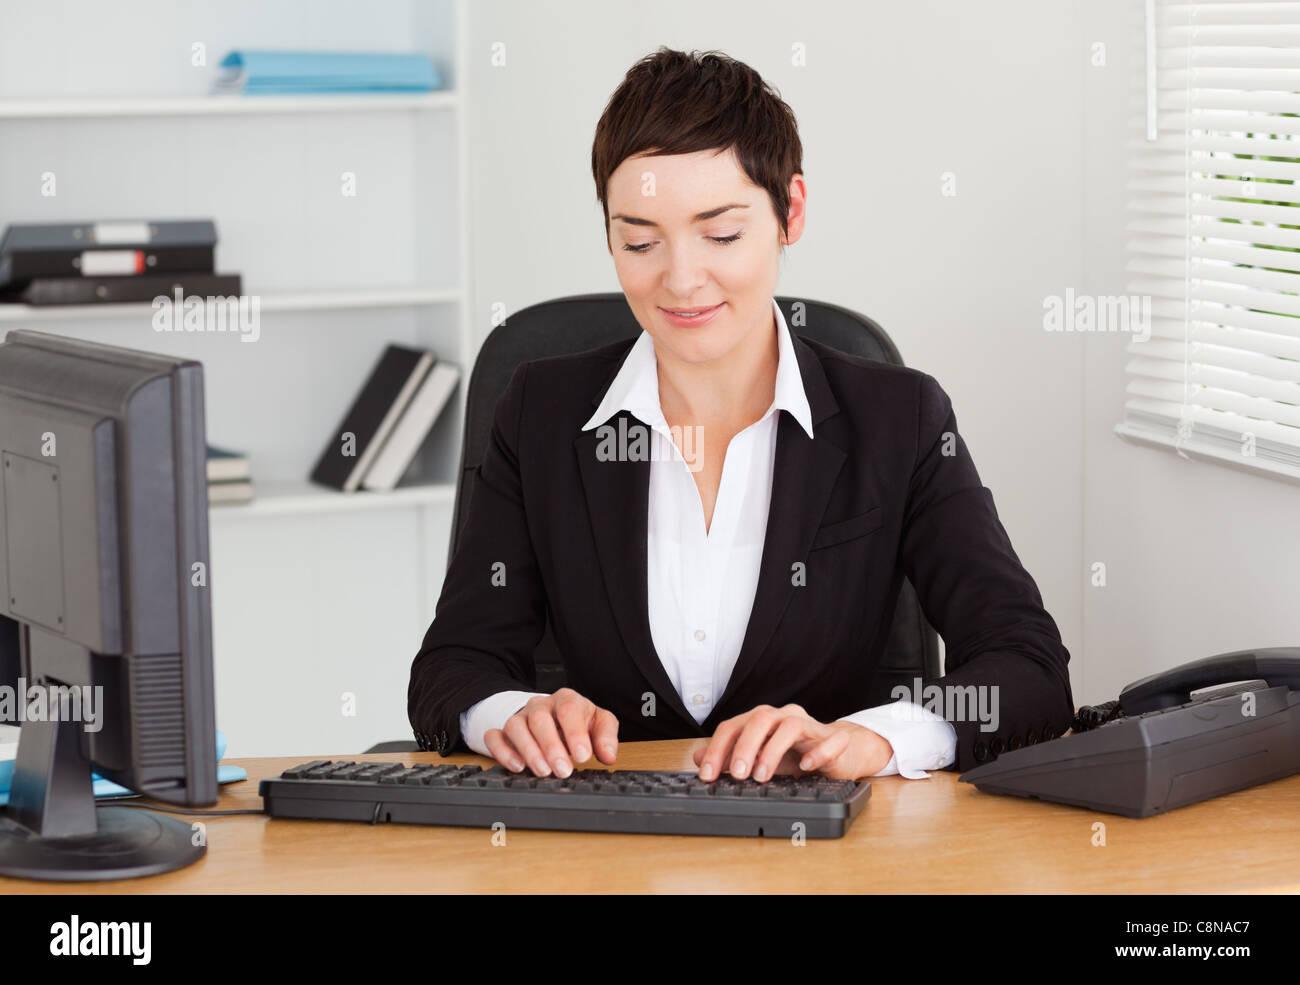 Secretary typing on her keybord - Stock Image